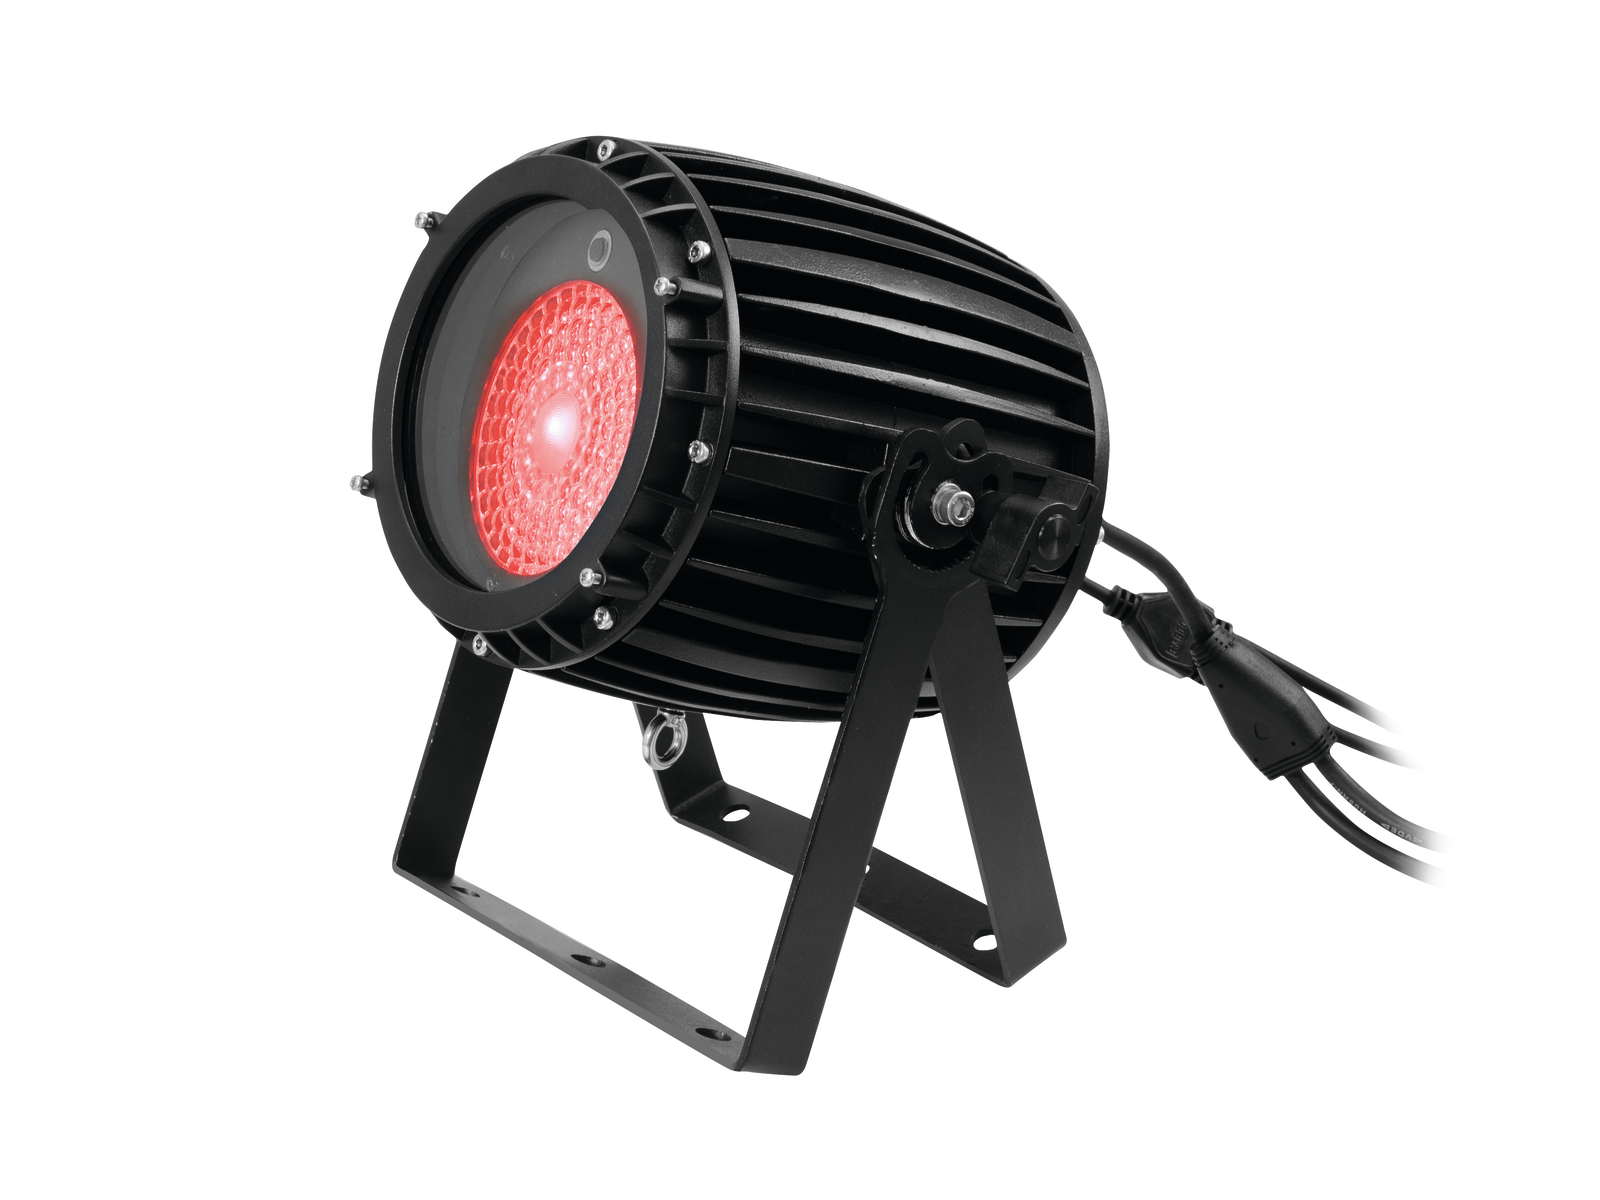 Eurolite LED IP PAR Z60 RGBW, 1xCOB LED, Zoom, IP65